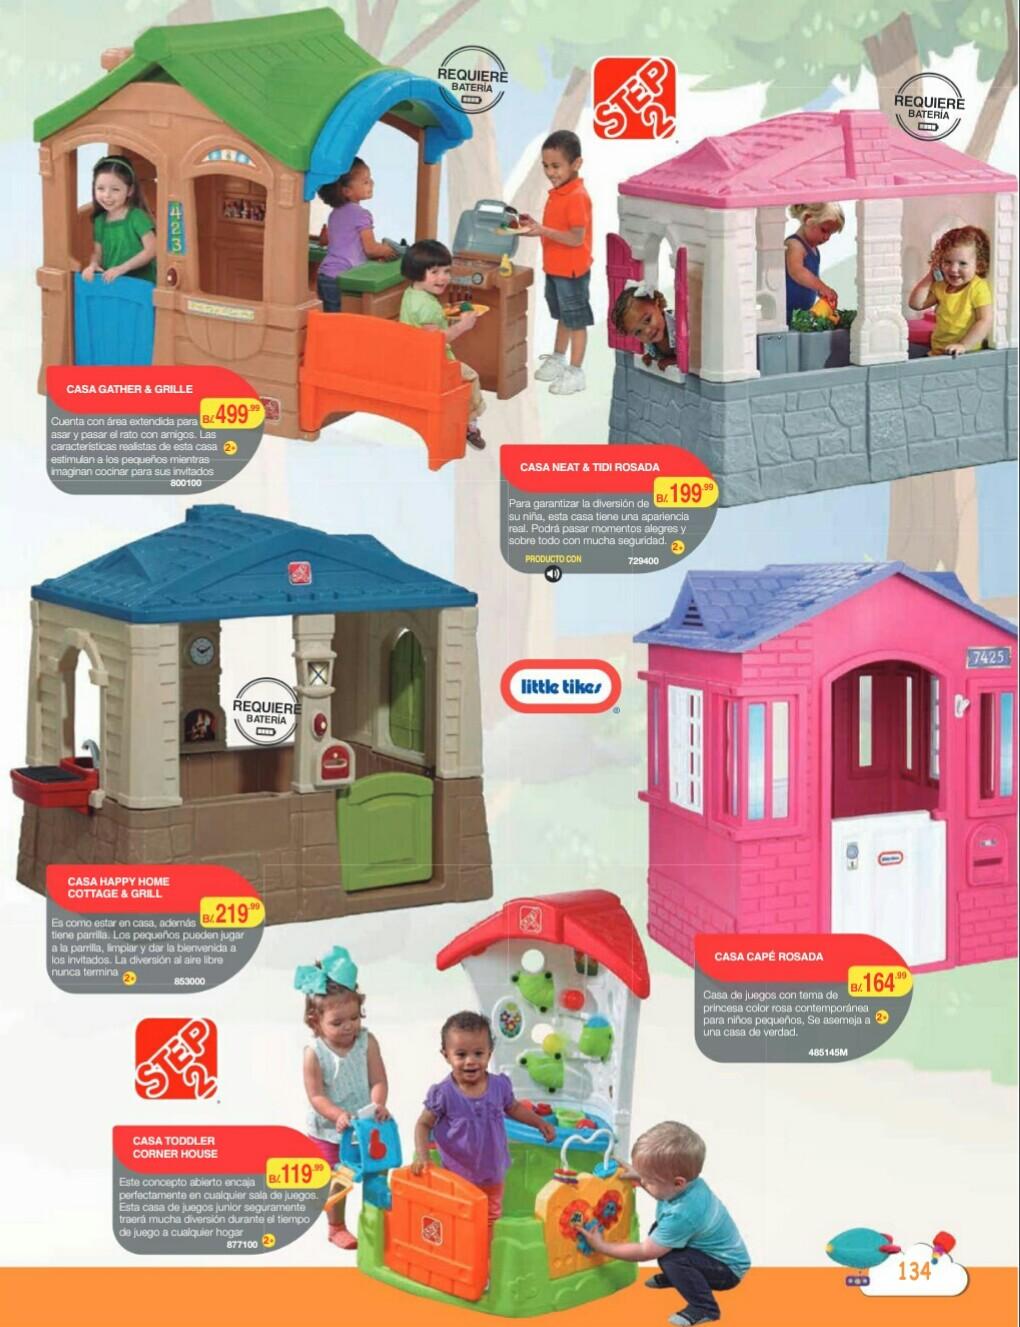 Catalogo juguetes Titan Toys 2018 p136